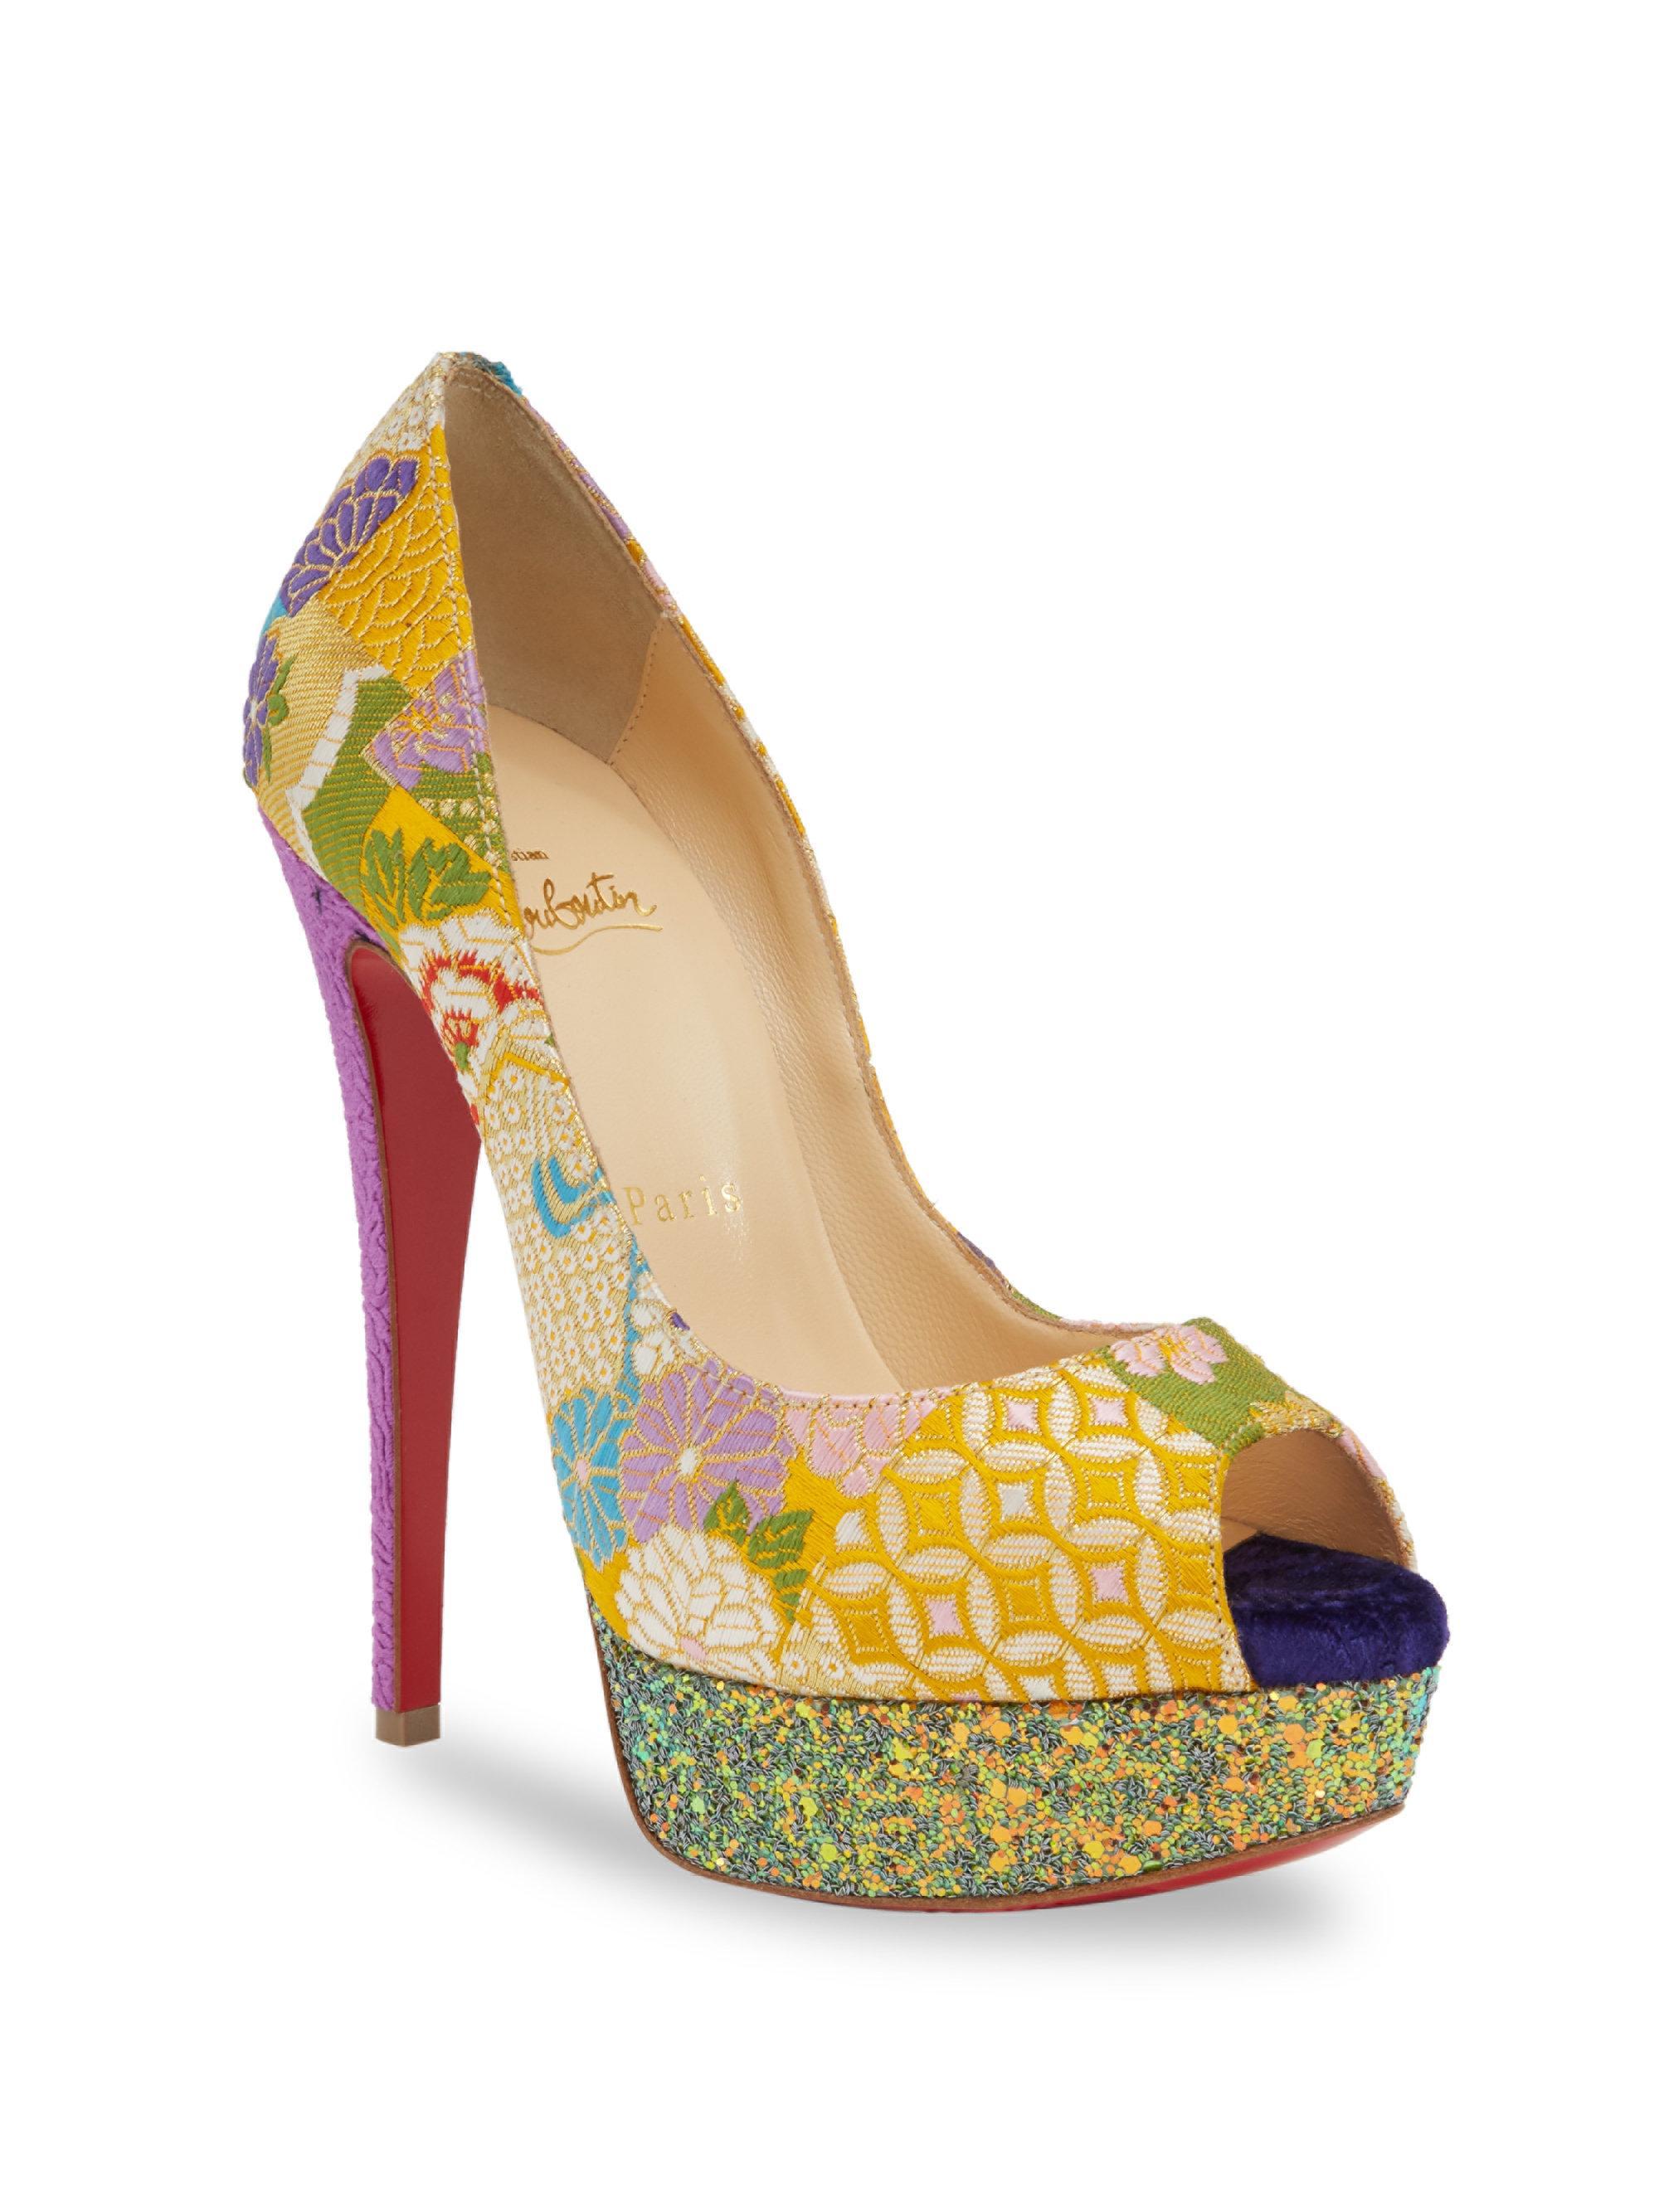 8965942f85b1 Lyst - Christian Louboutin Classique Lady Peep 150 Floral   Glitter ...